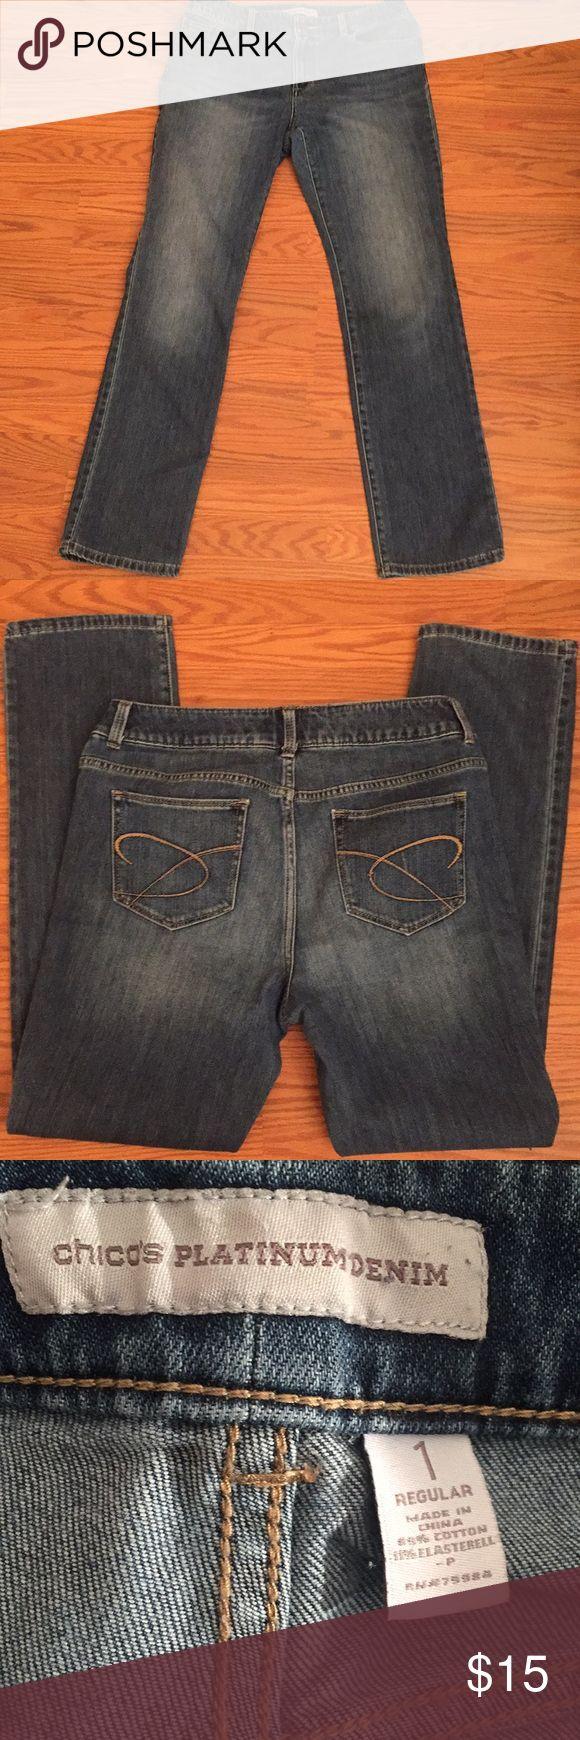 "Chico's jeans Chico's platinum denim, inseam 30"" Chico's size 1 ( see chart) Chico's Jeans Straight Leg"